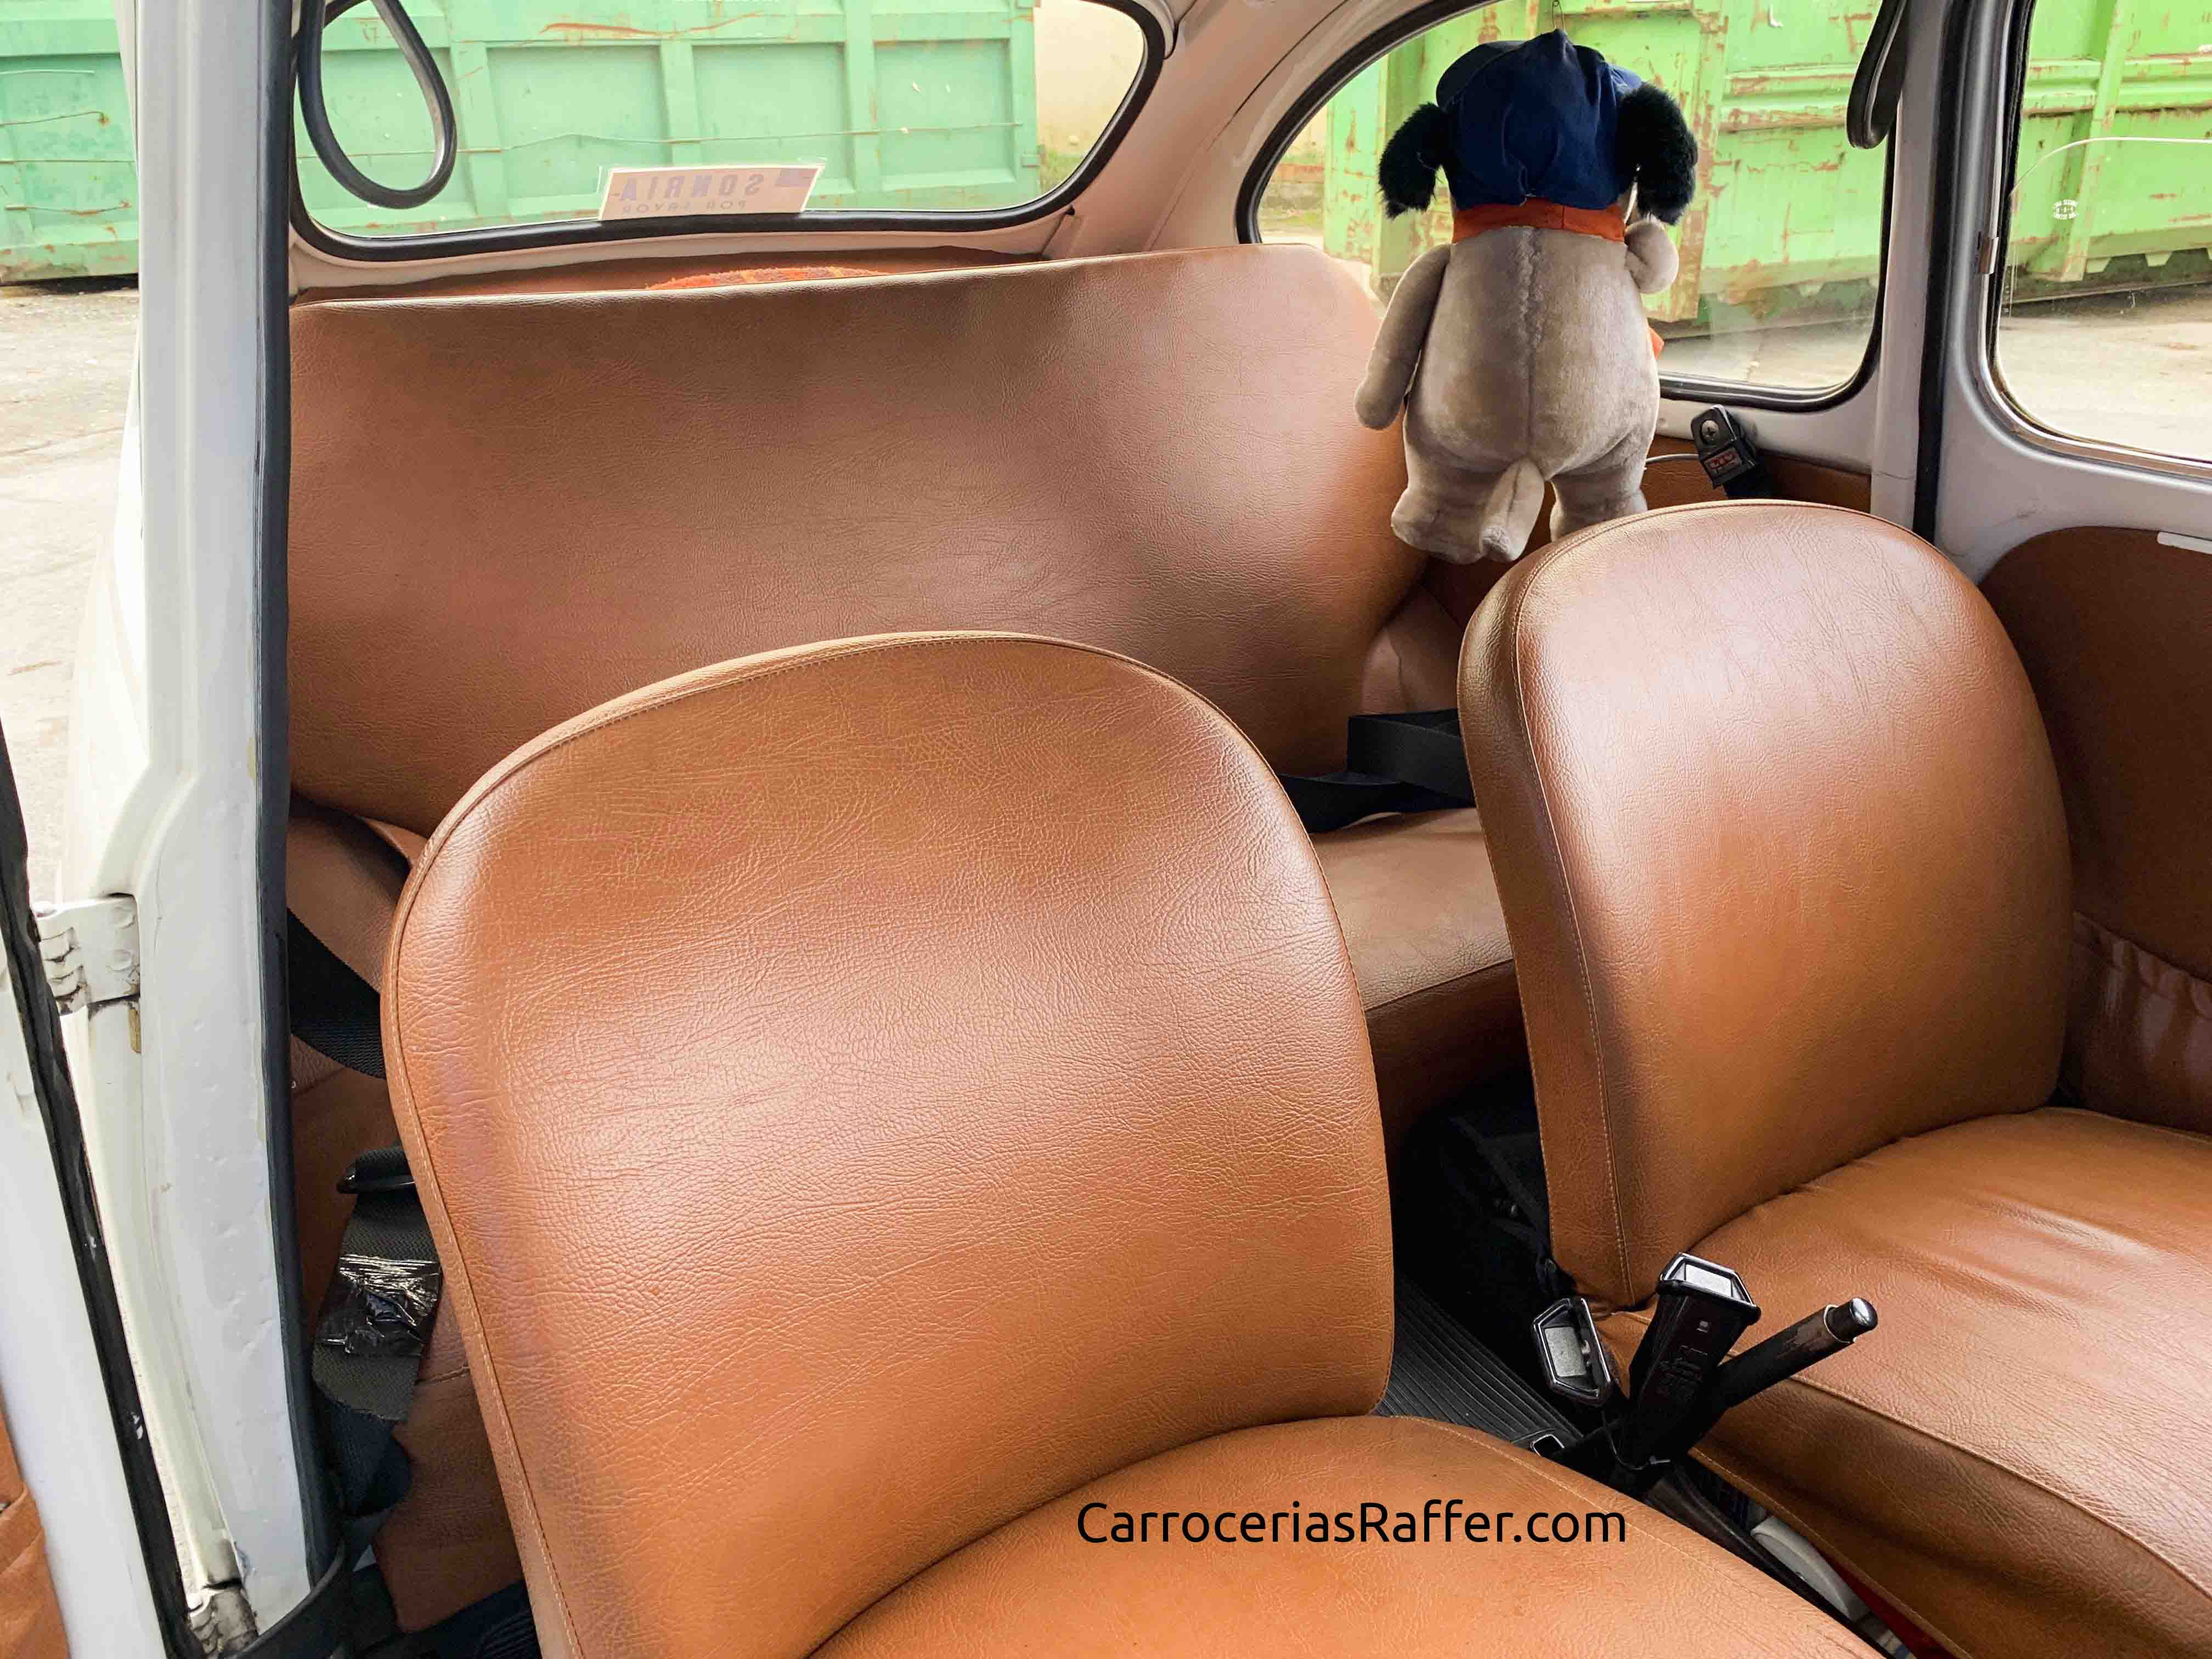 7 seat 600 descapotable carrocerias raffer hernani donostia